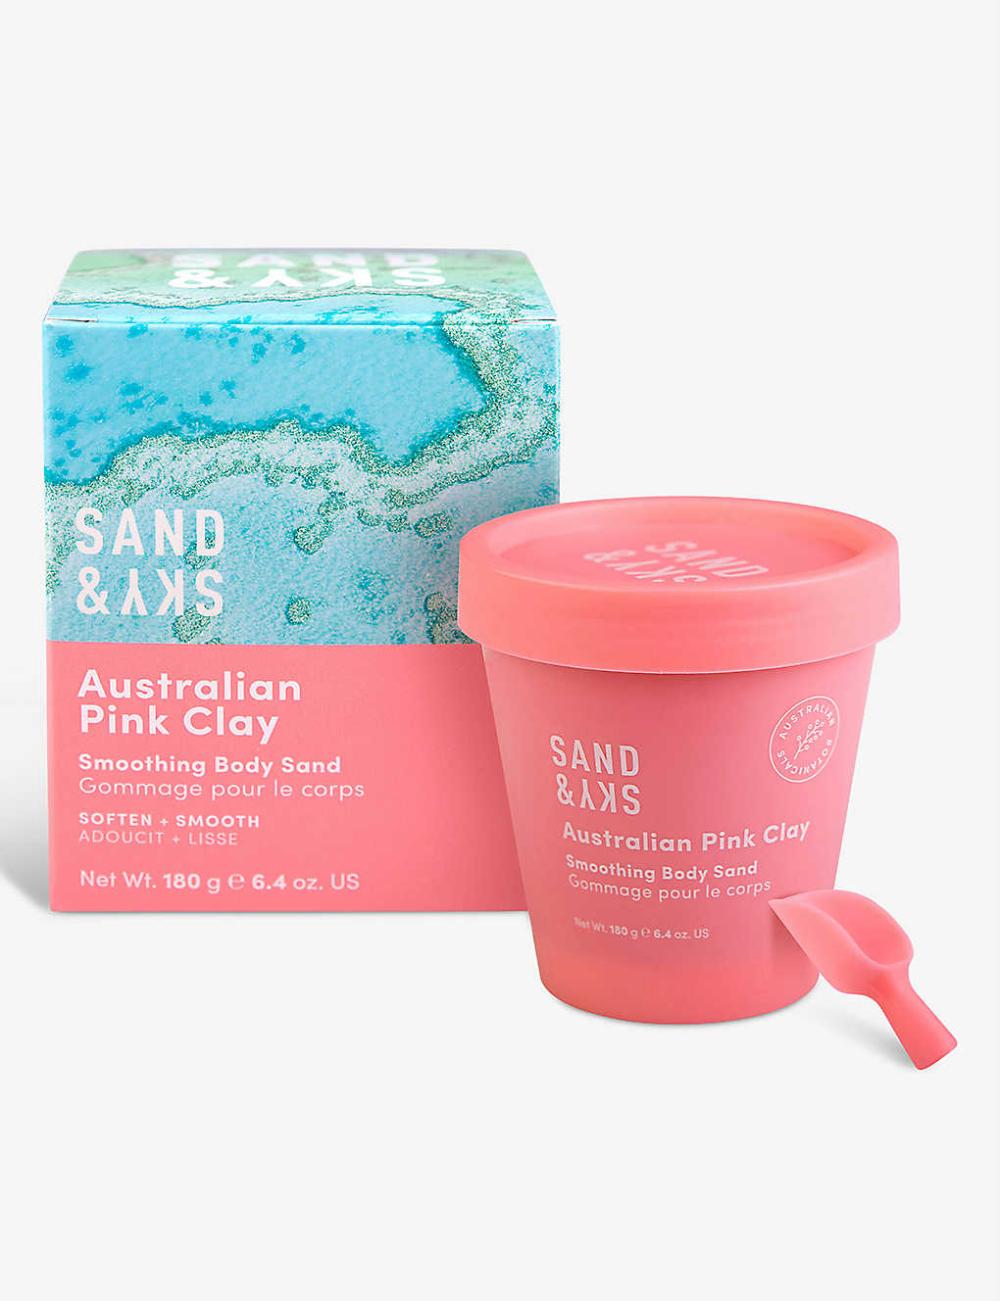 SAND & SKY Australian Pink Clay Smoothing Body Sand scrub